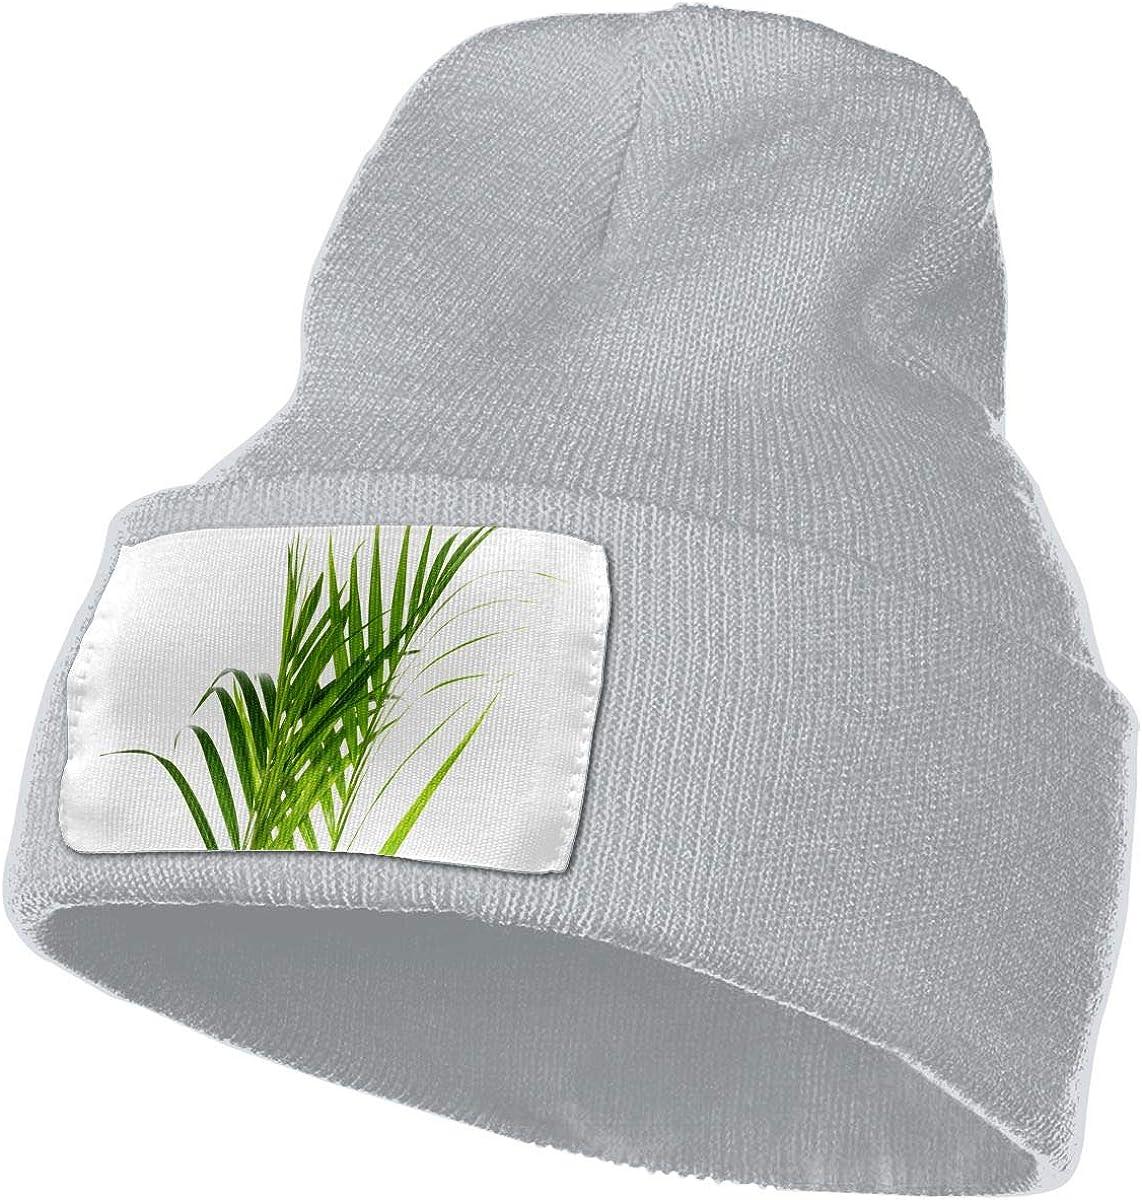 QZqDQ Malibu Coconut Tree Unisex Fashion Knitted Hat Luxury Hip-Hop Cap